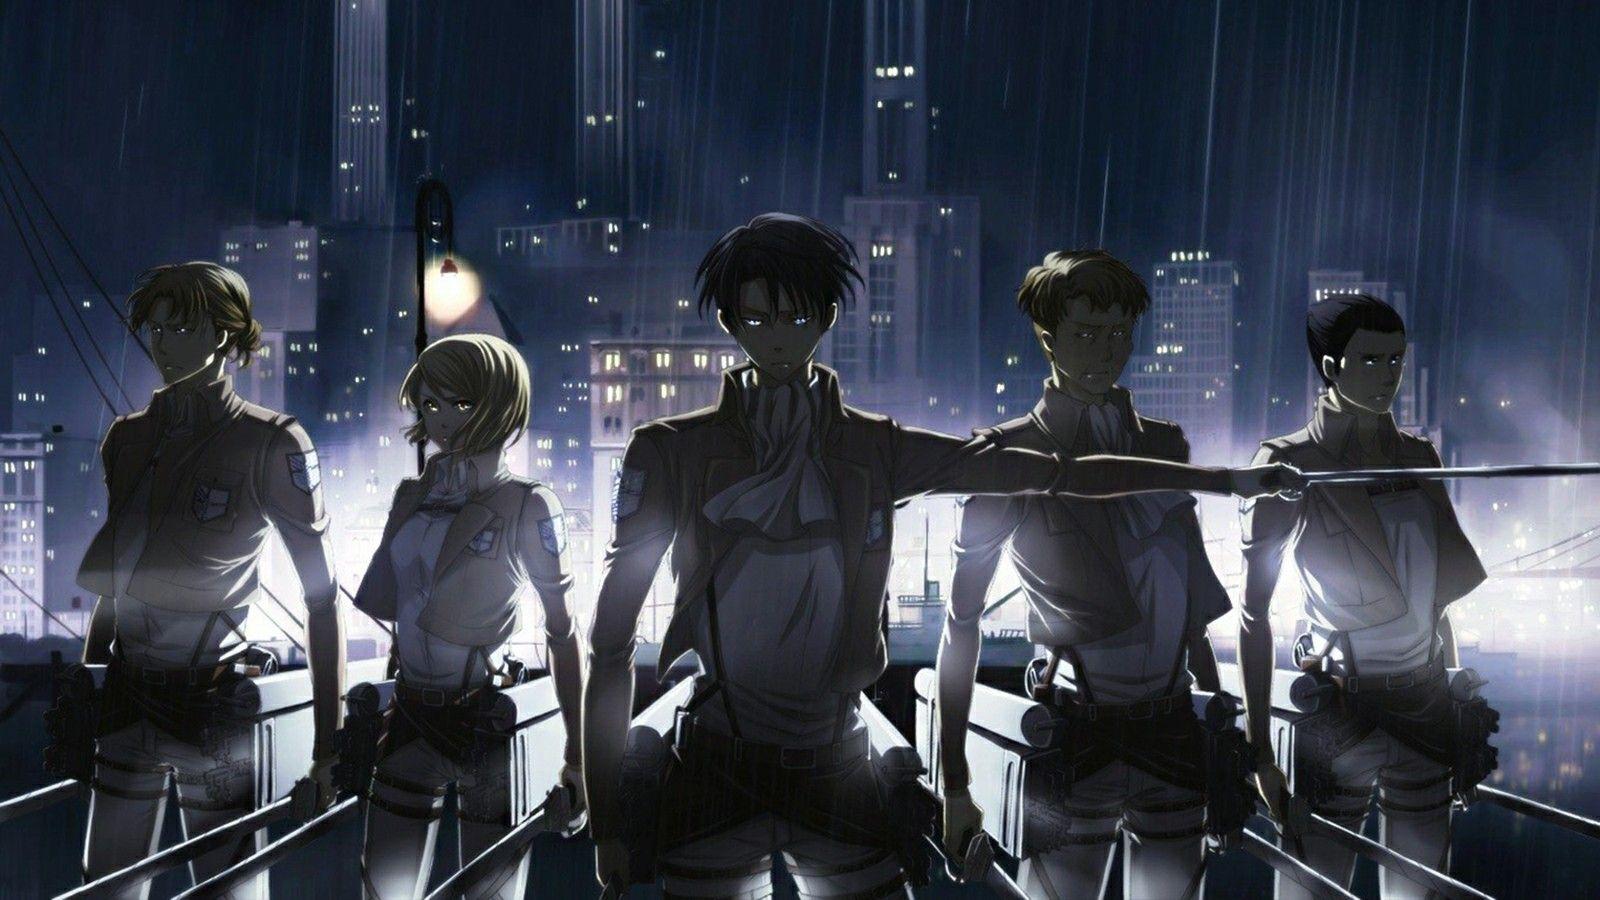 Attack On Titan Original Levi Squad Wallpaper Part 1 Of 3 Attack On Titan Anime Anime Wallpaper Anime